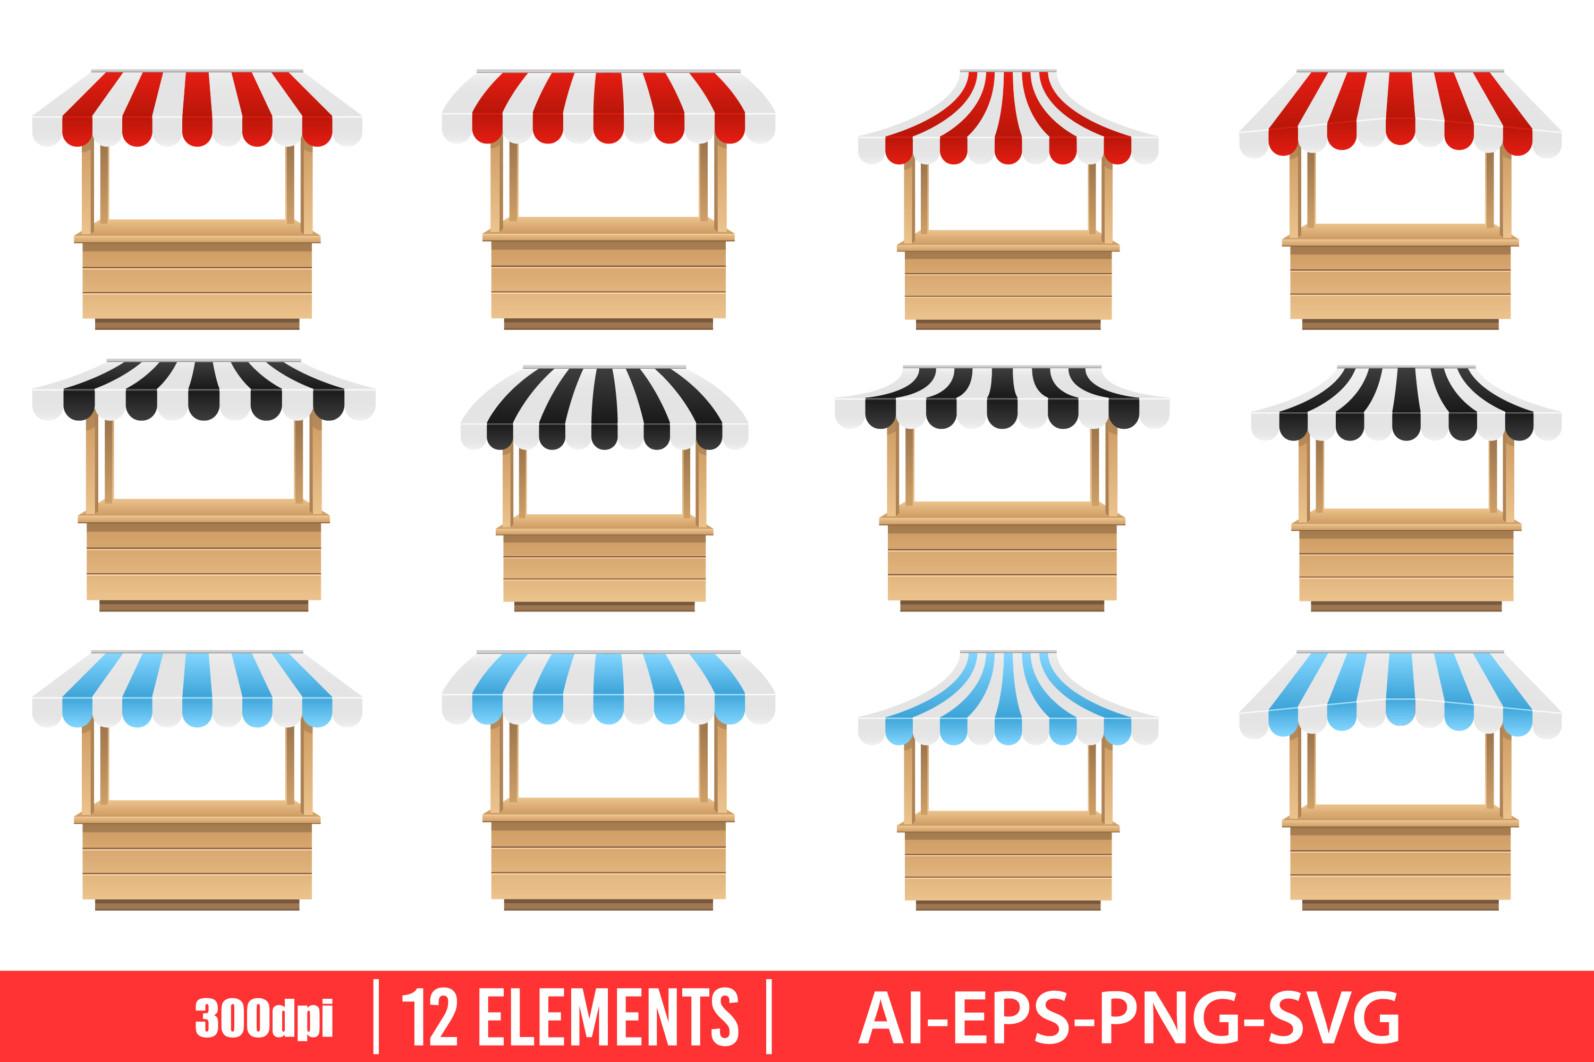 Empty market stall clipart vector design illustration. Empty market stall set. Vector Clipart Print - EMPTY MARKET scaled -